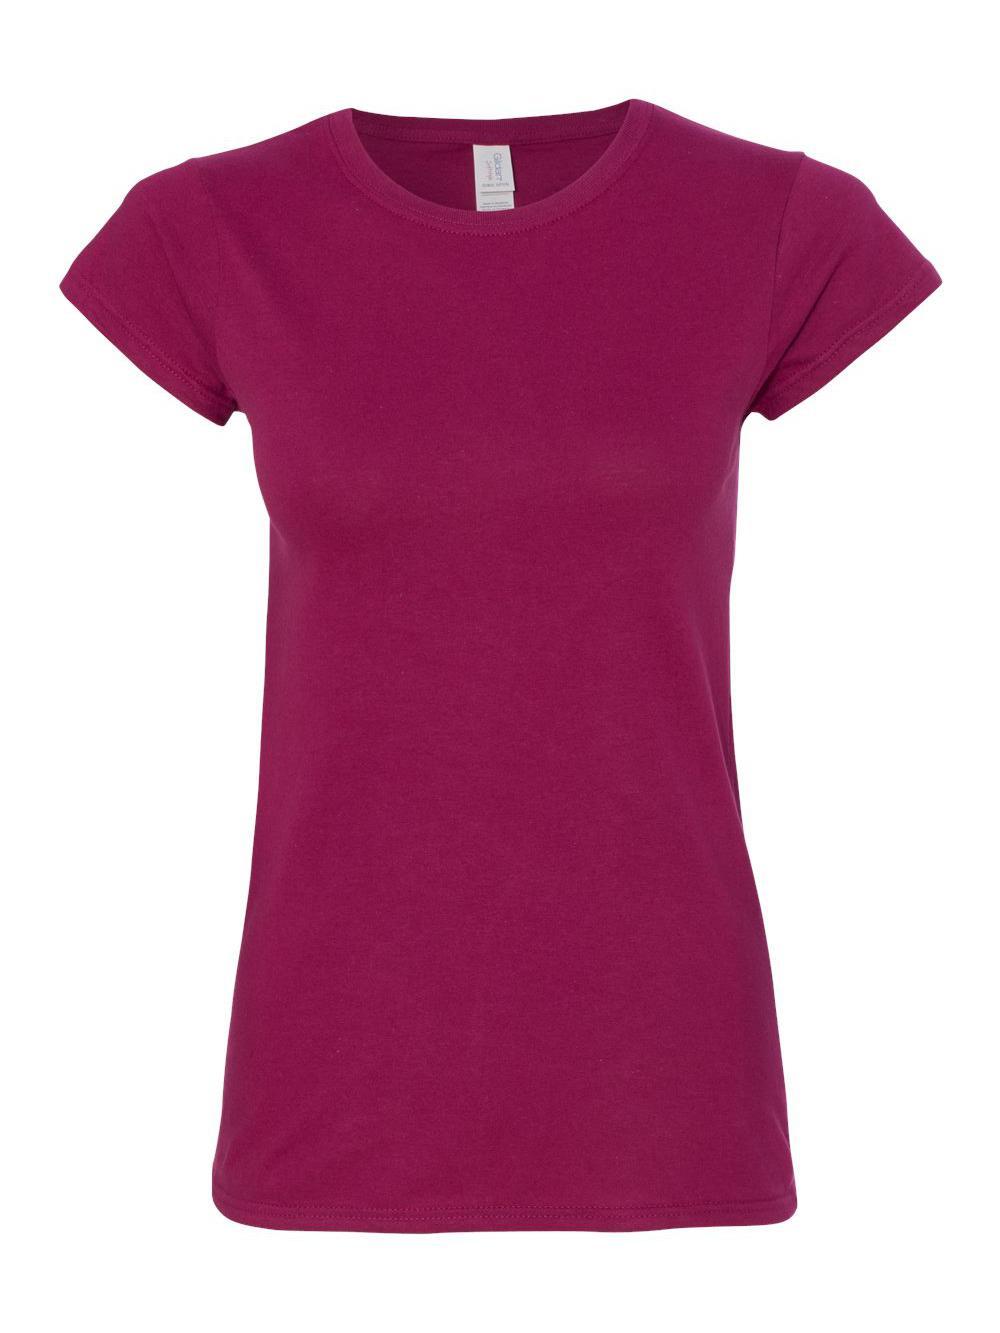 Gildan-Softstyle-Women-039-s-T-Shirt-64000L thumbnail 9